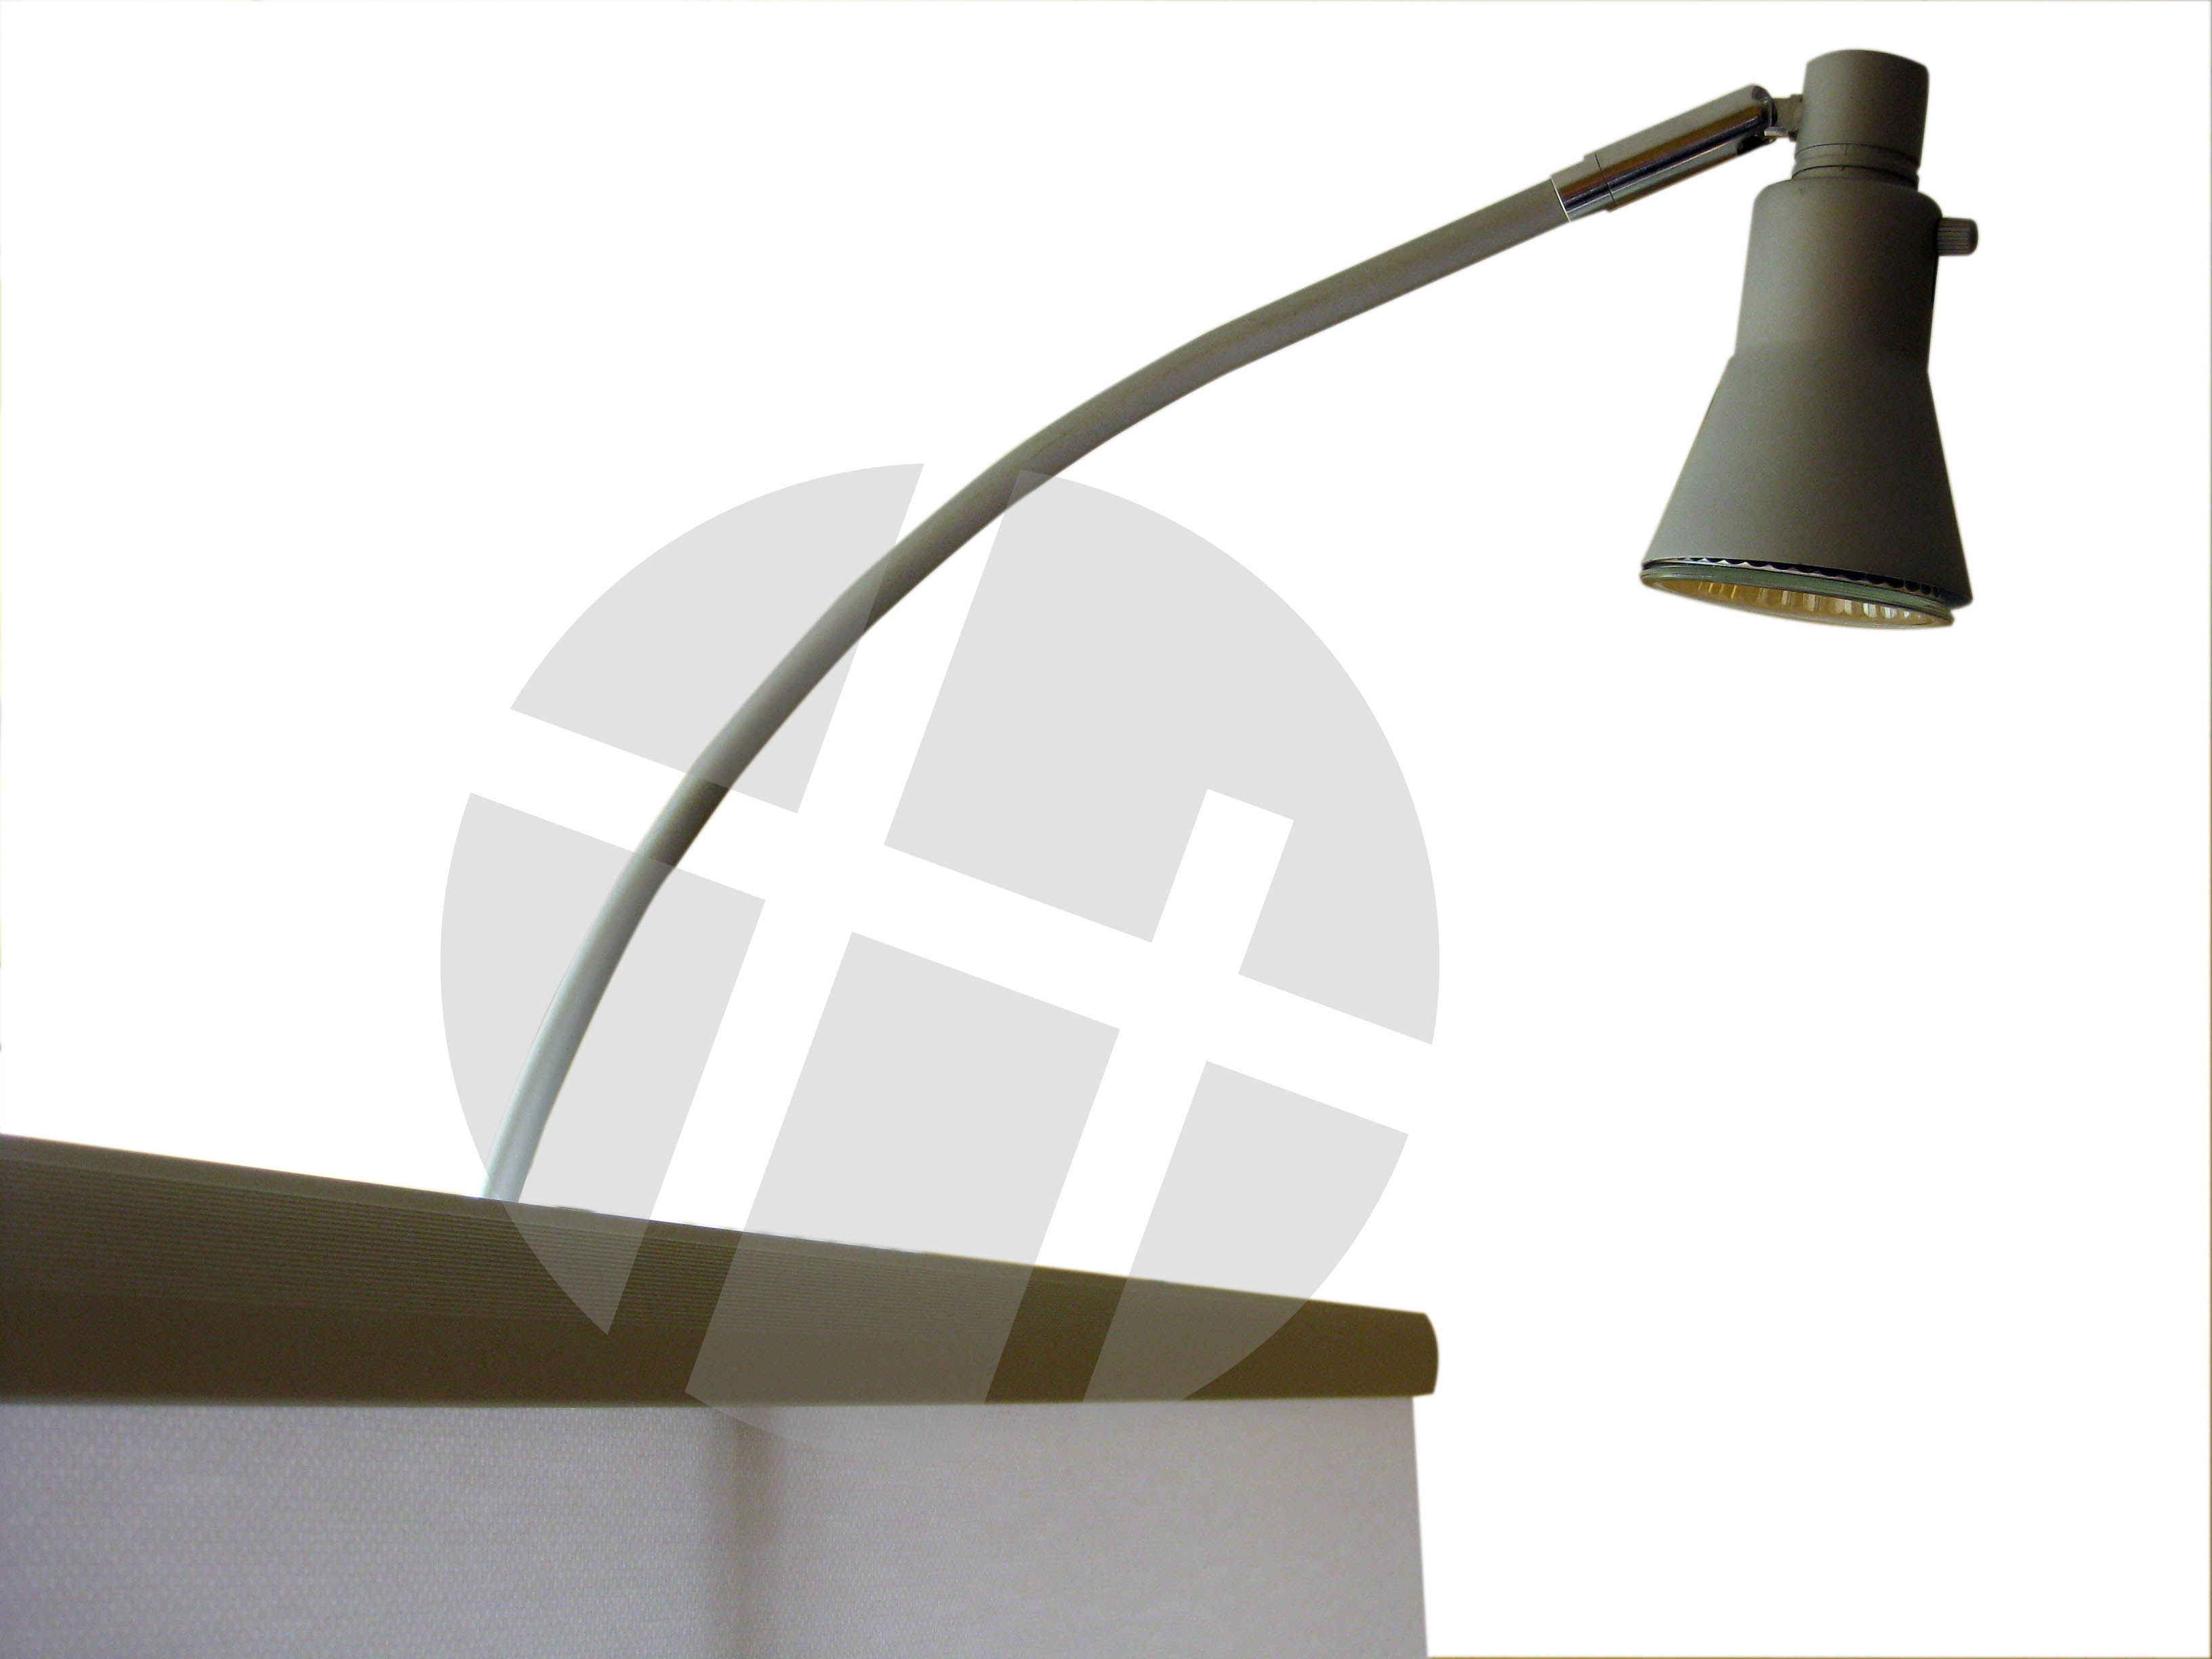 halogen lampe f r roll ups und bannersysteme. Black Bedroom Furniture Sets. Home Design Ideas